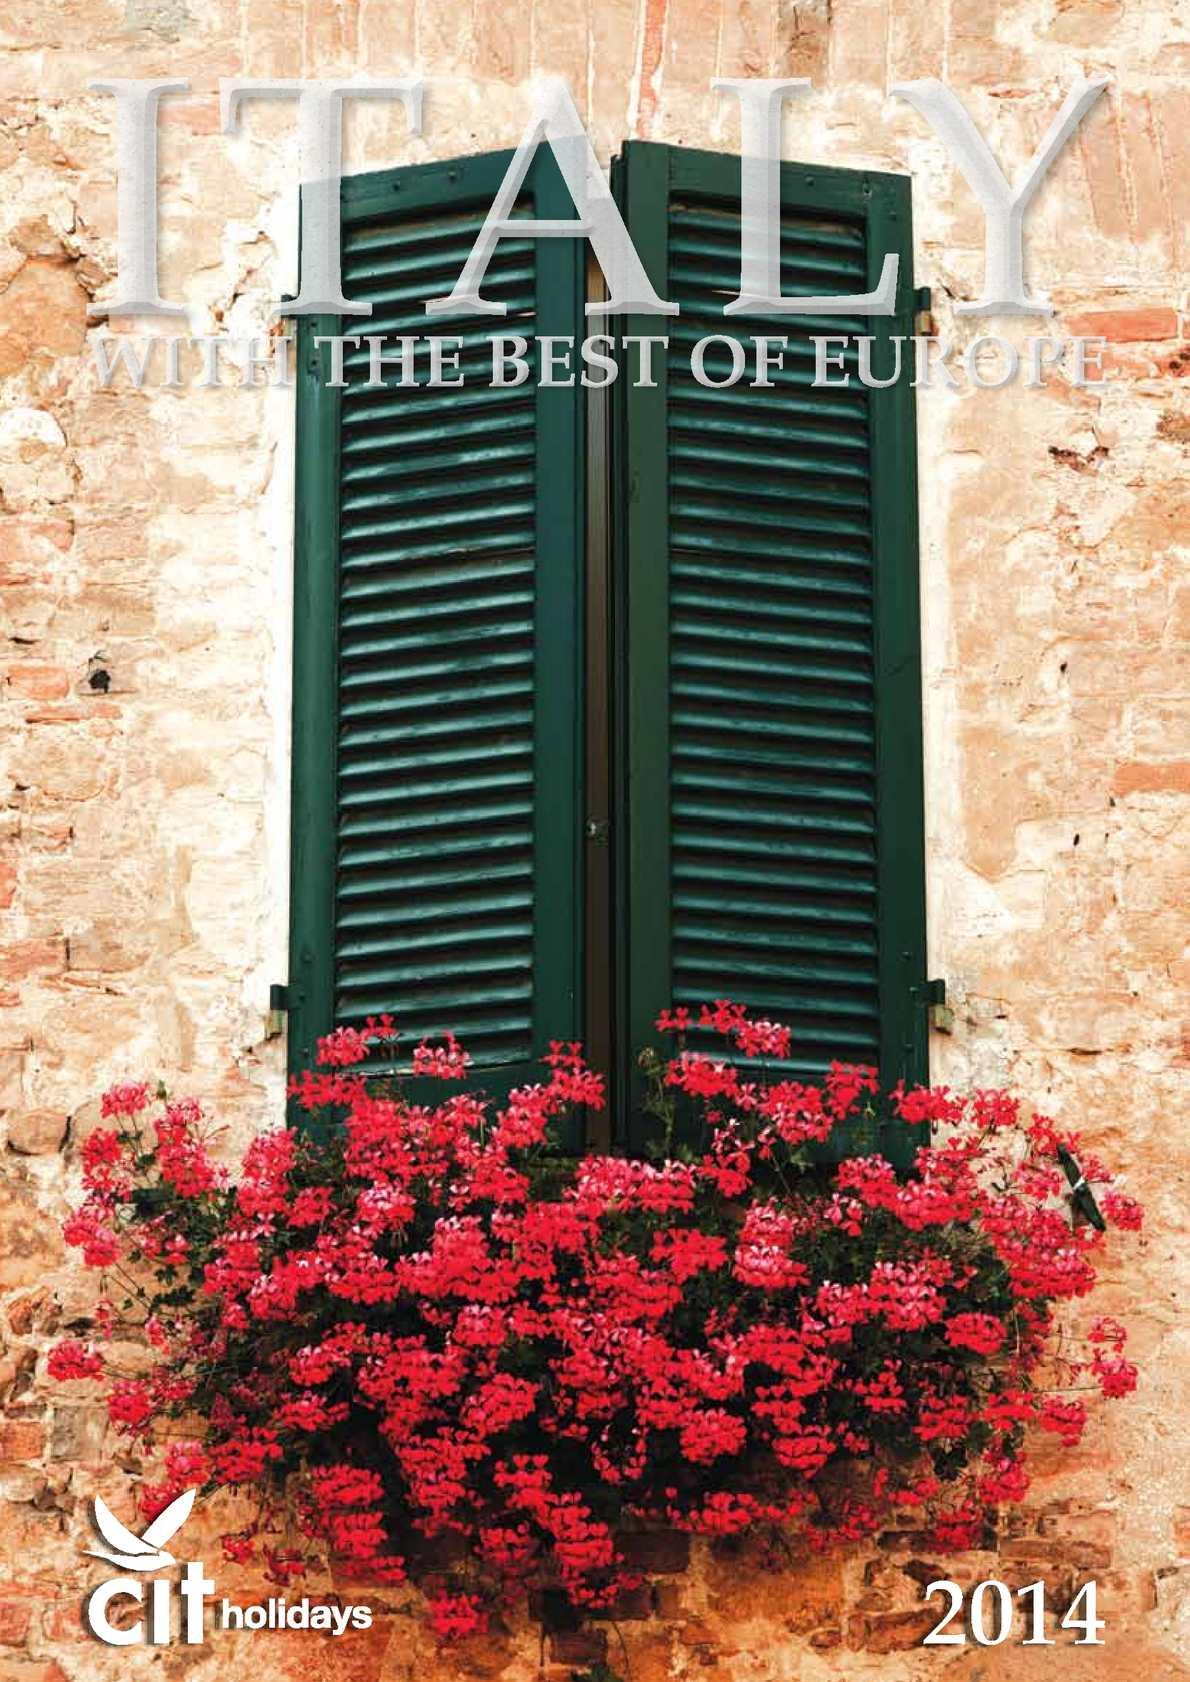 8680ae024 Calaméo - CIT Italy and Europe Holidays 2014